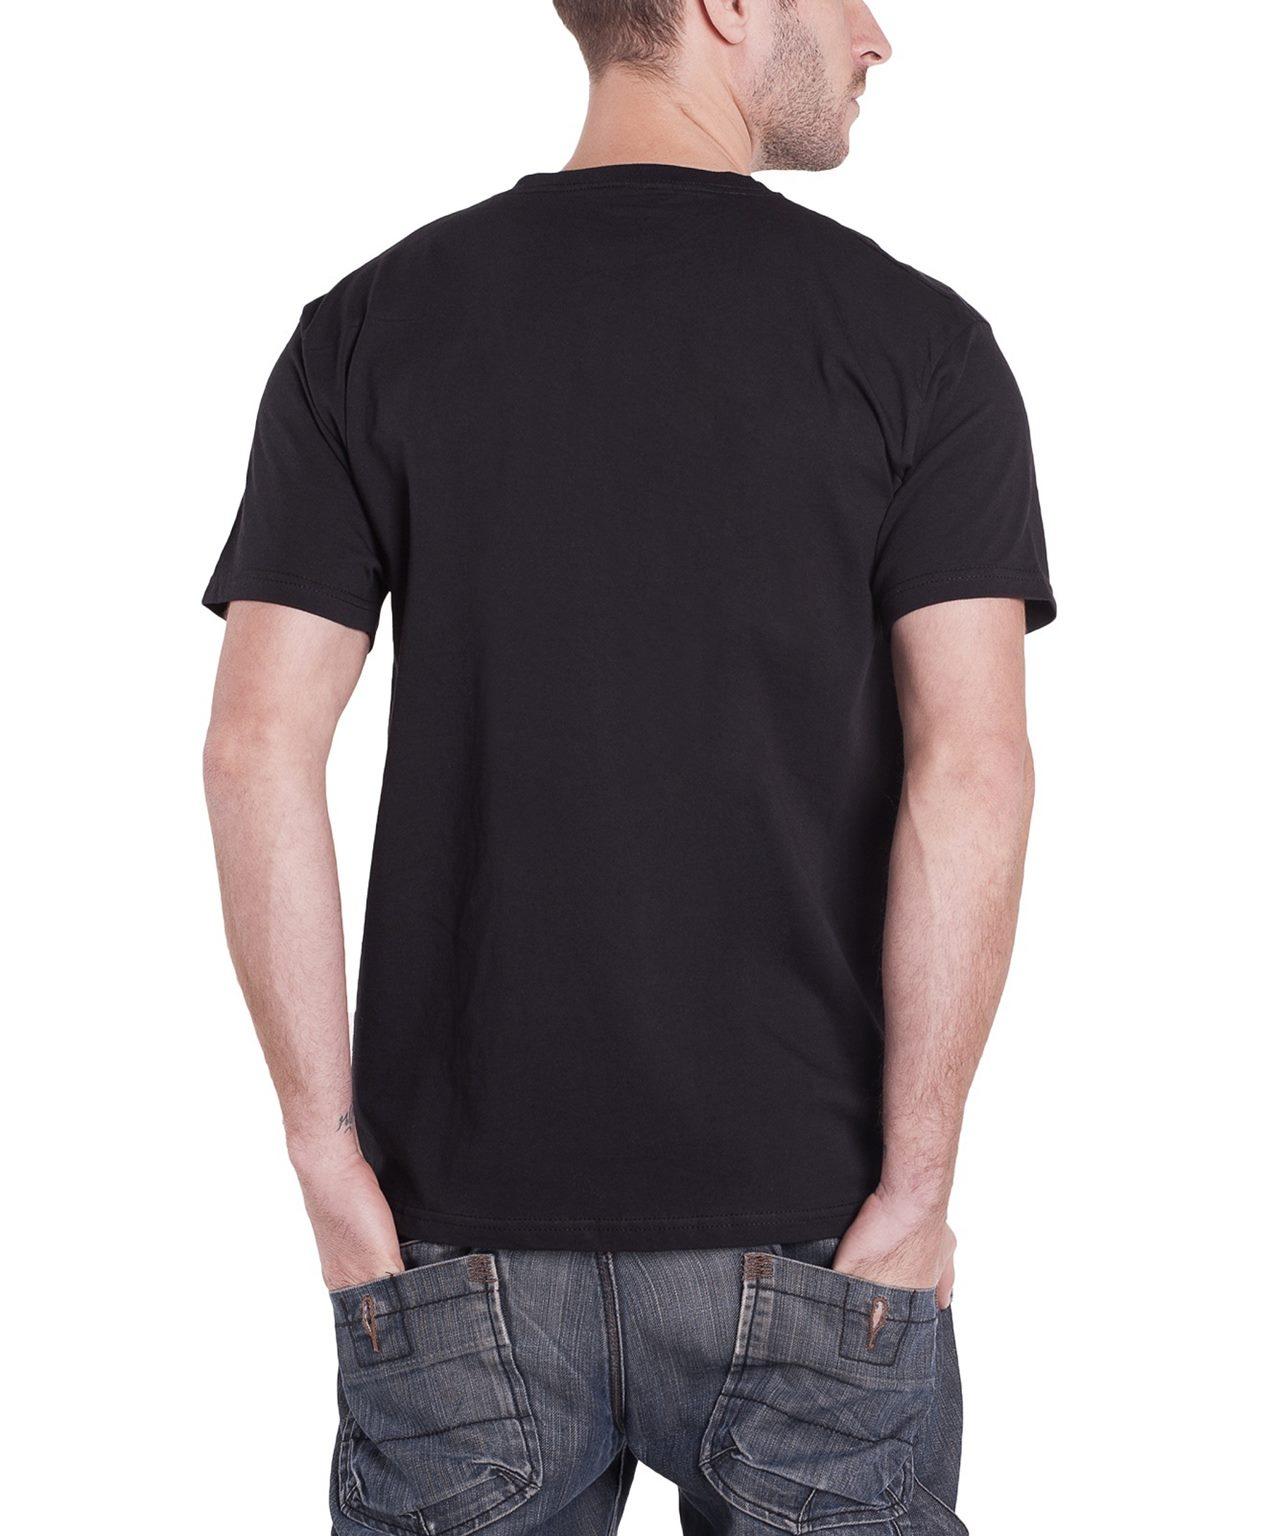 b6fbe81c Pink Floyd T Shirt Mens Black T Shirt Animals Swirl band logo new official    Trade Me